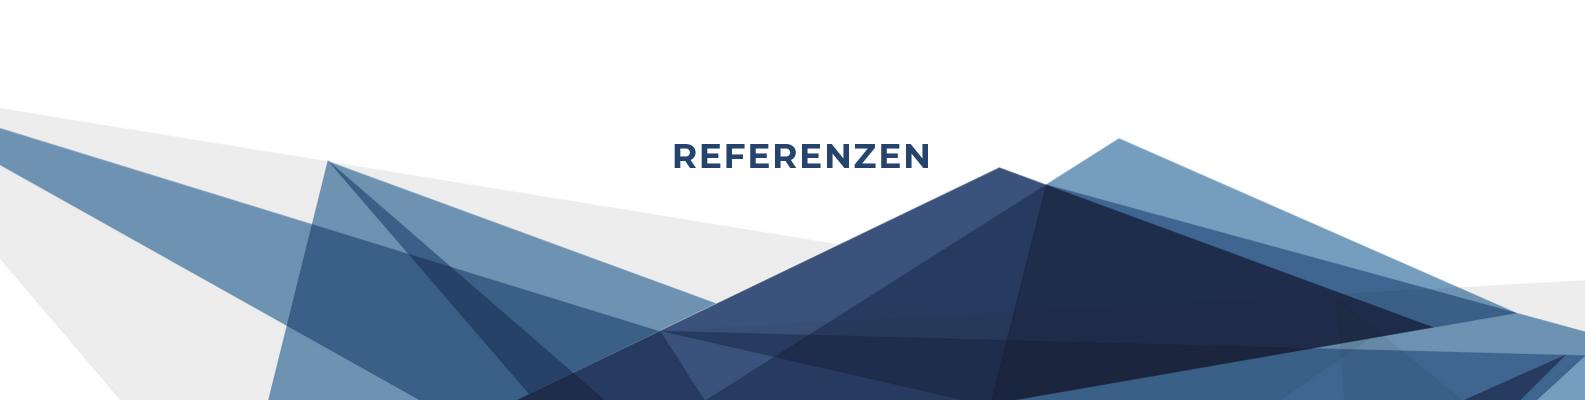 bausachverstaendiger-Axel-Fischer-referenzen